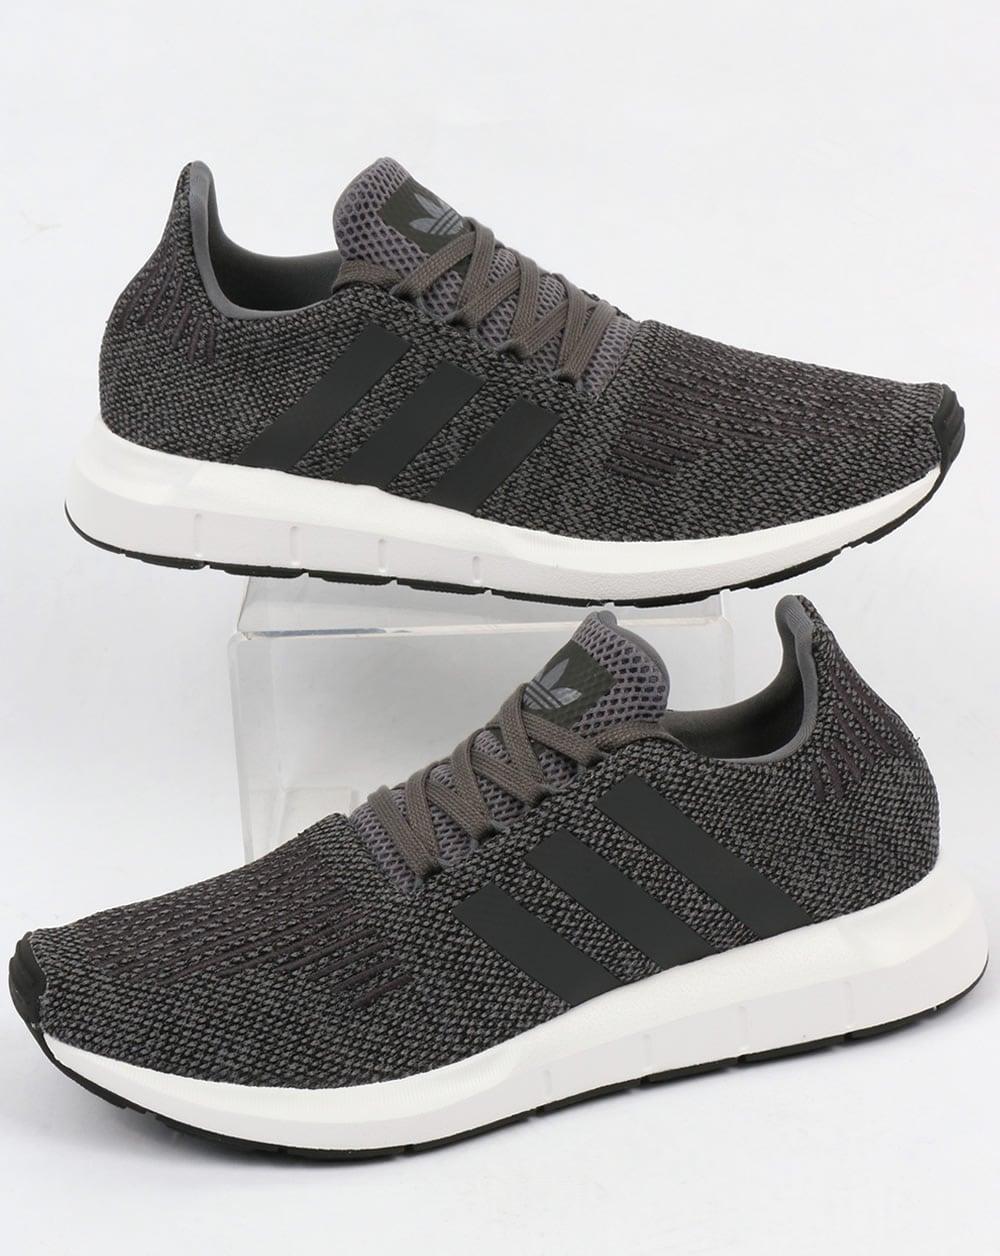 f4e2f6eae1549 adidas Trainers Adidas Swift Run Trainers Grey Black